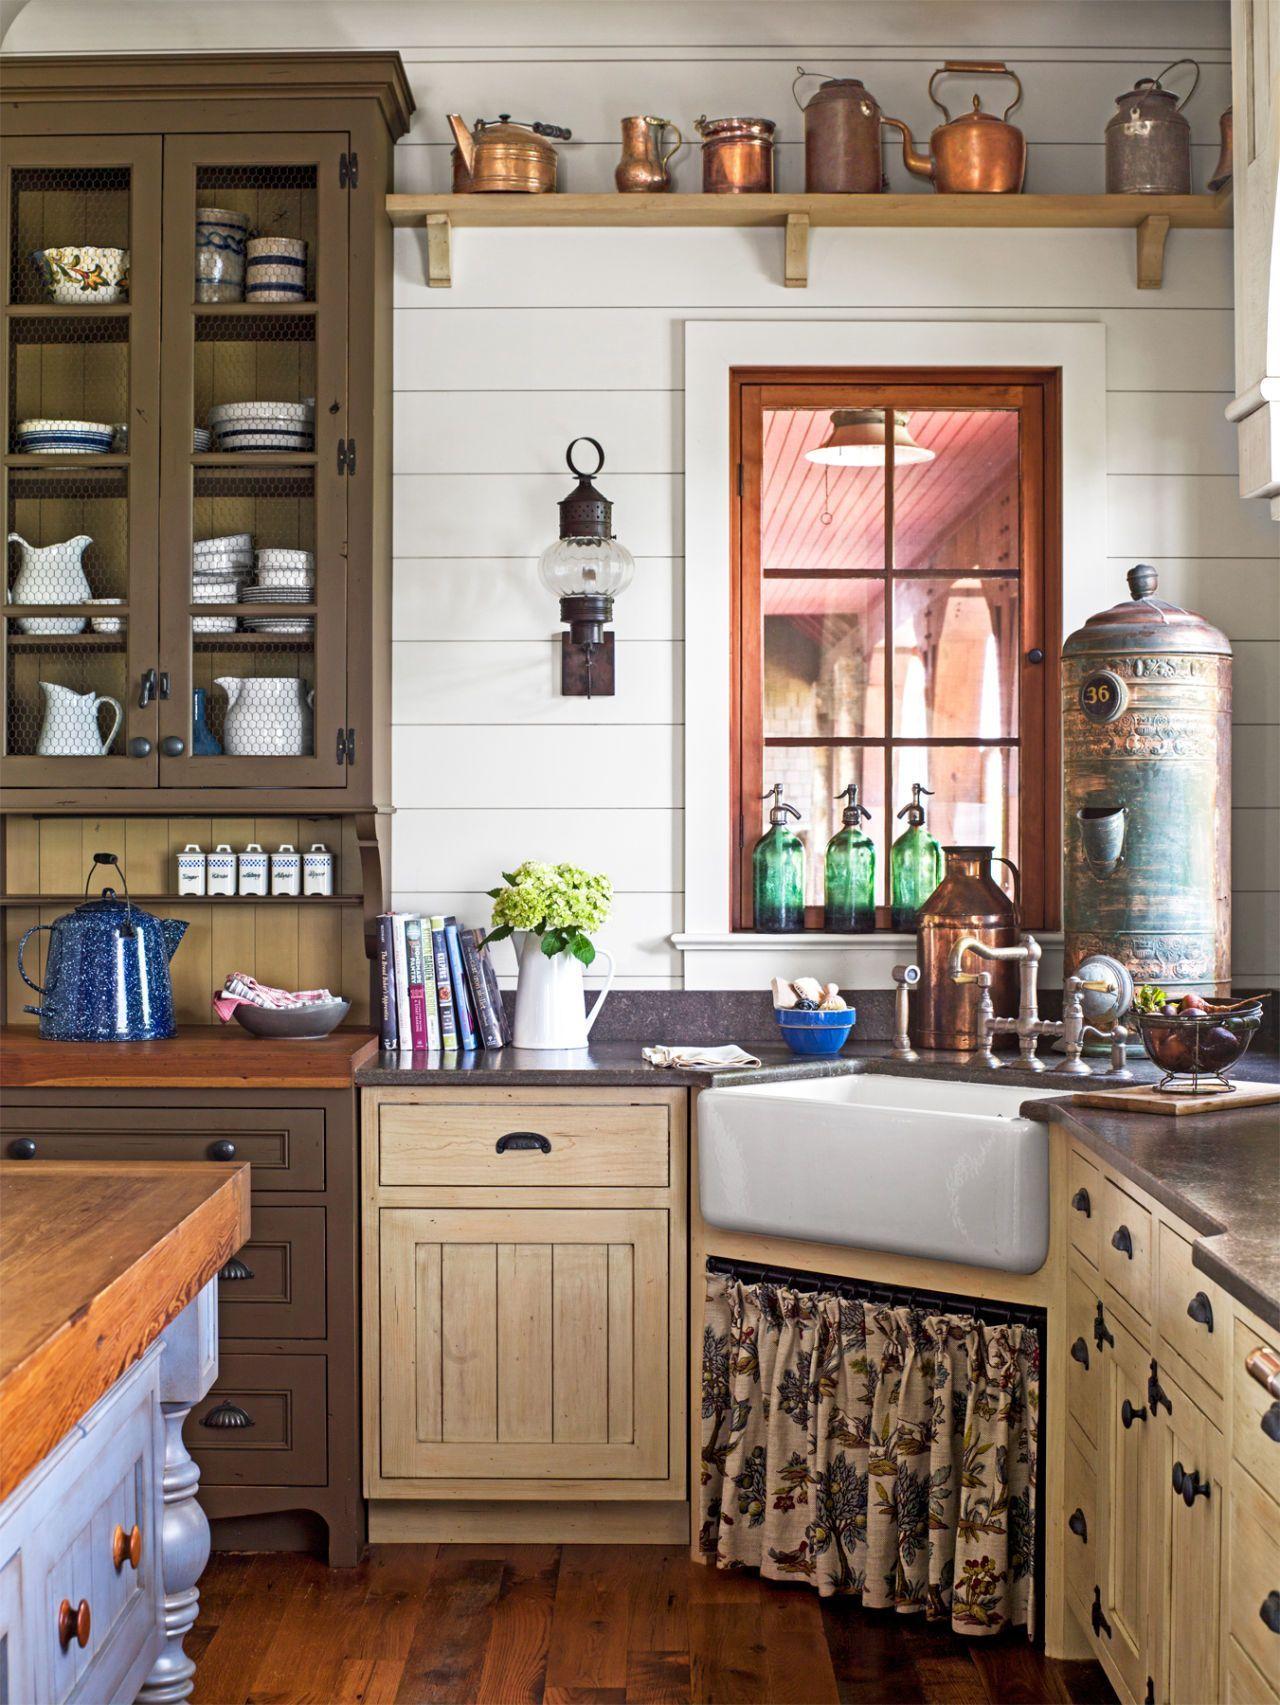 23 corner kitchen sink ideas for best cooking experience